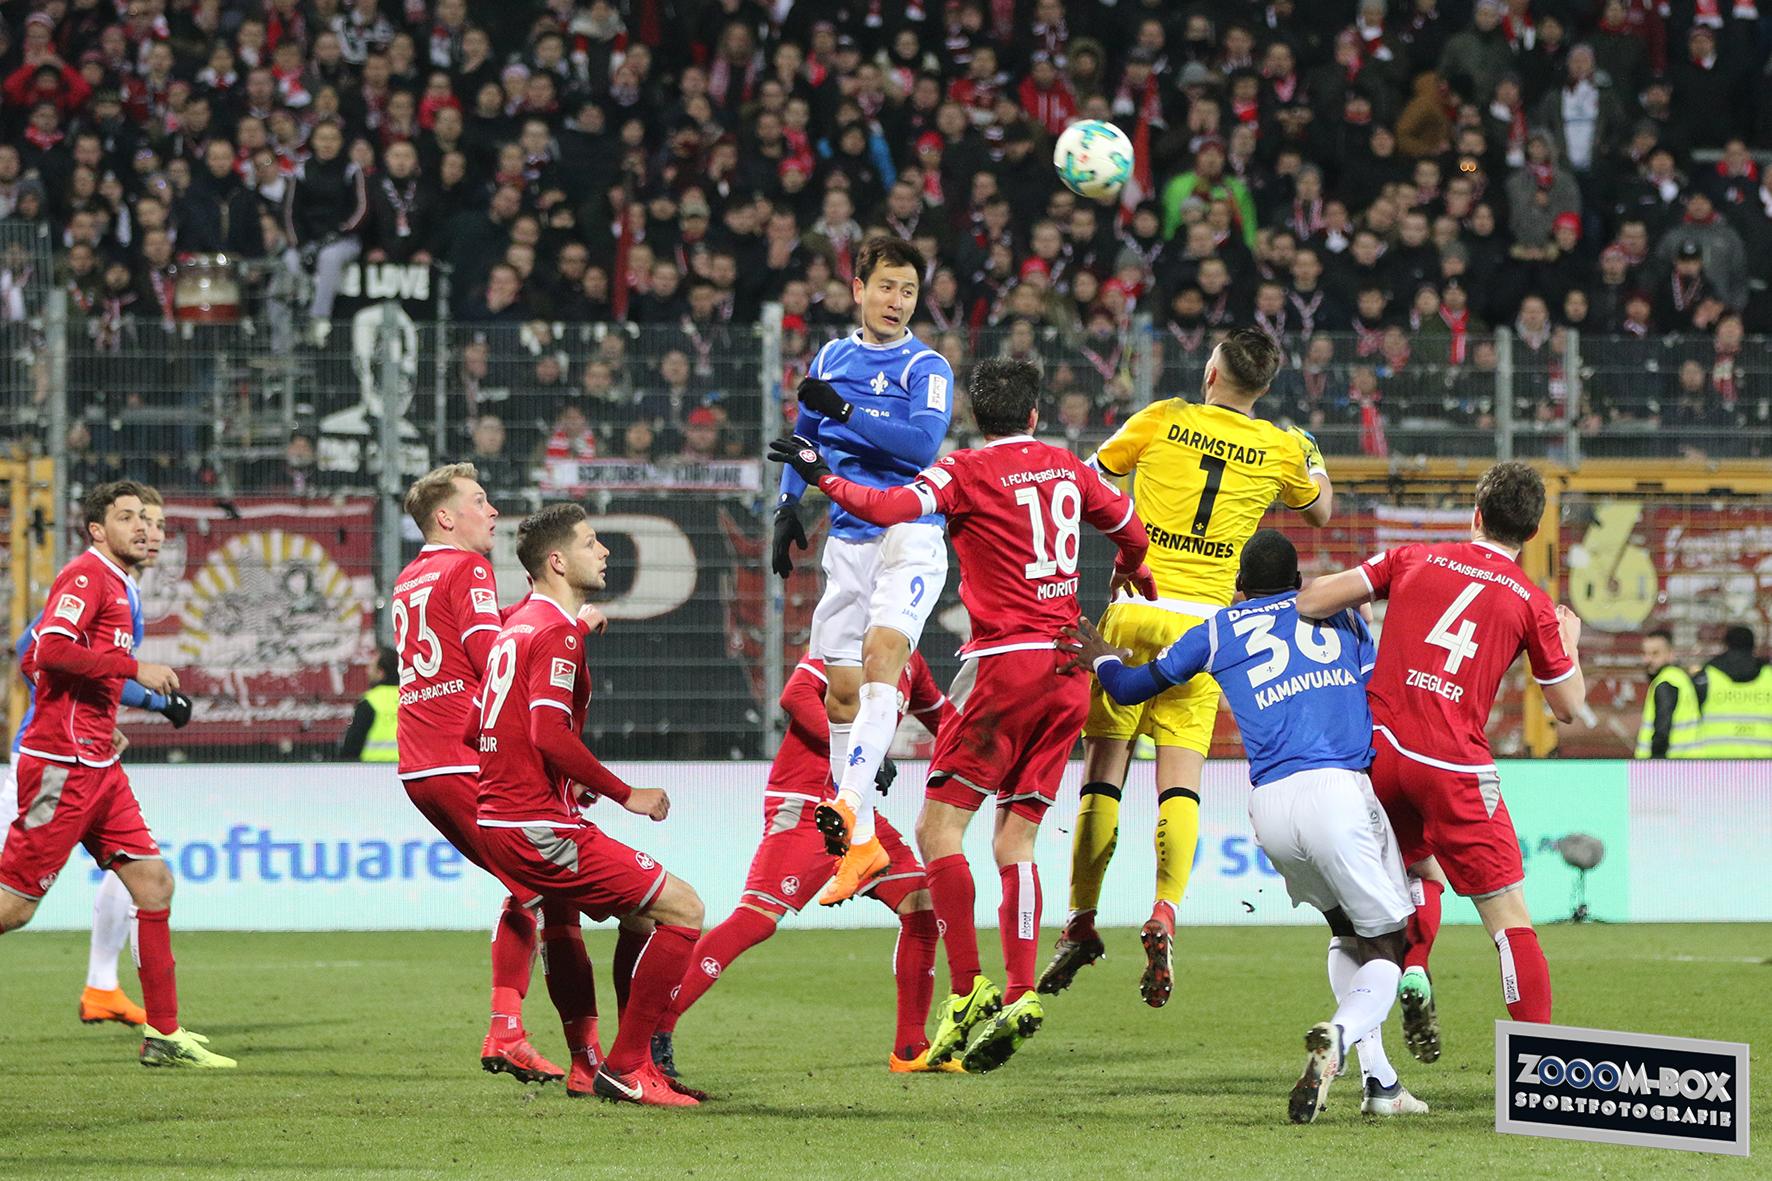 Spielbericht Sv Darmstadt 98 1 Fc Kaiserslautern We Fight